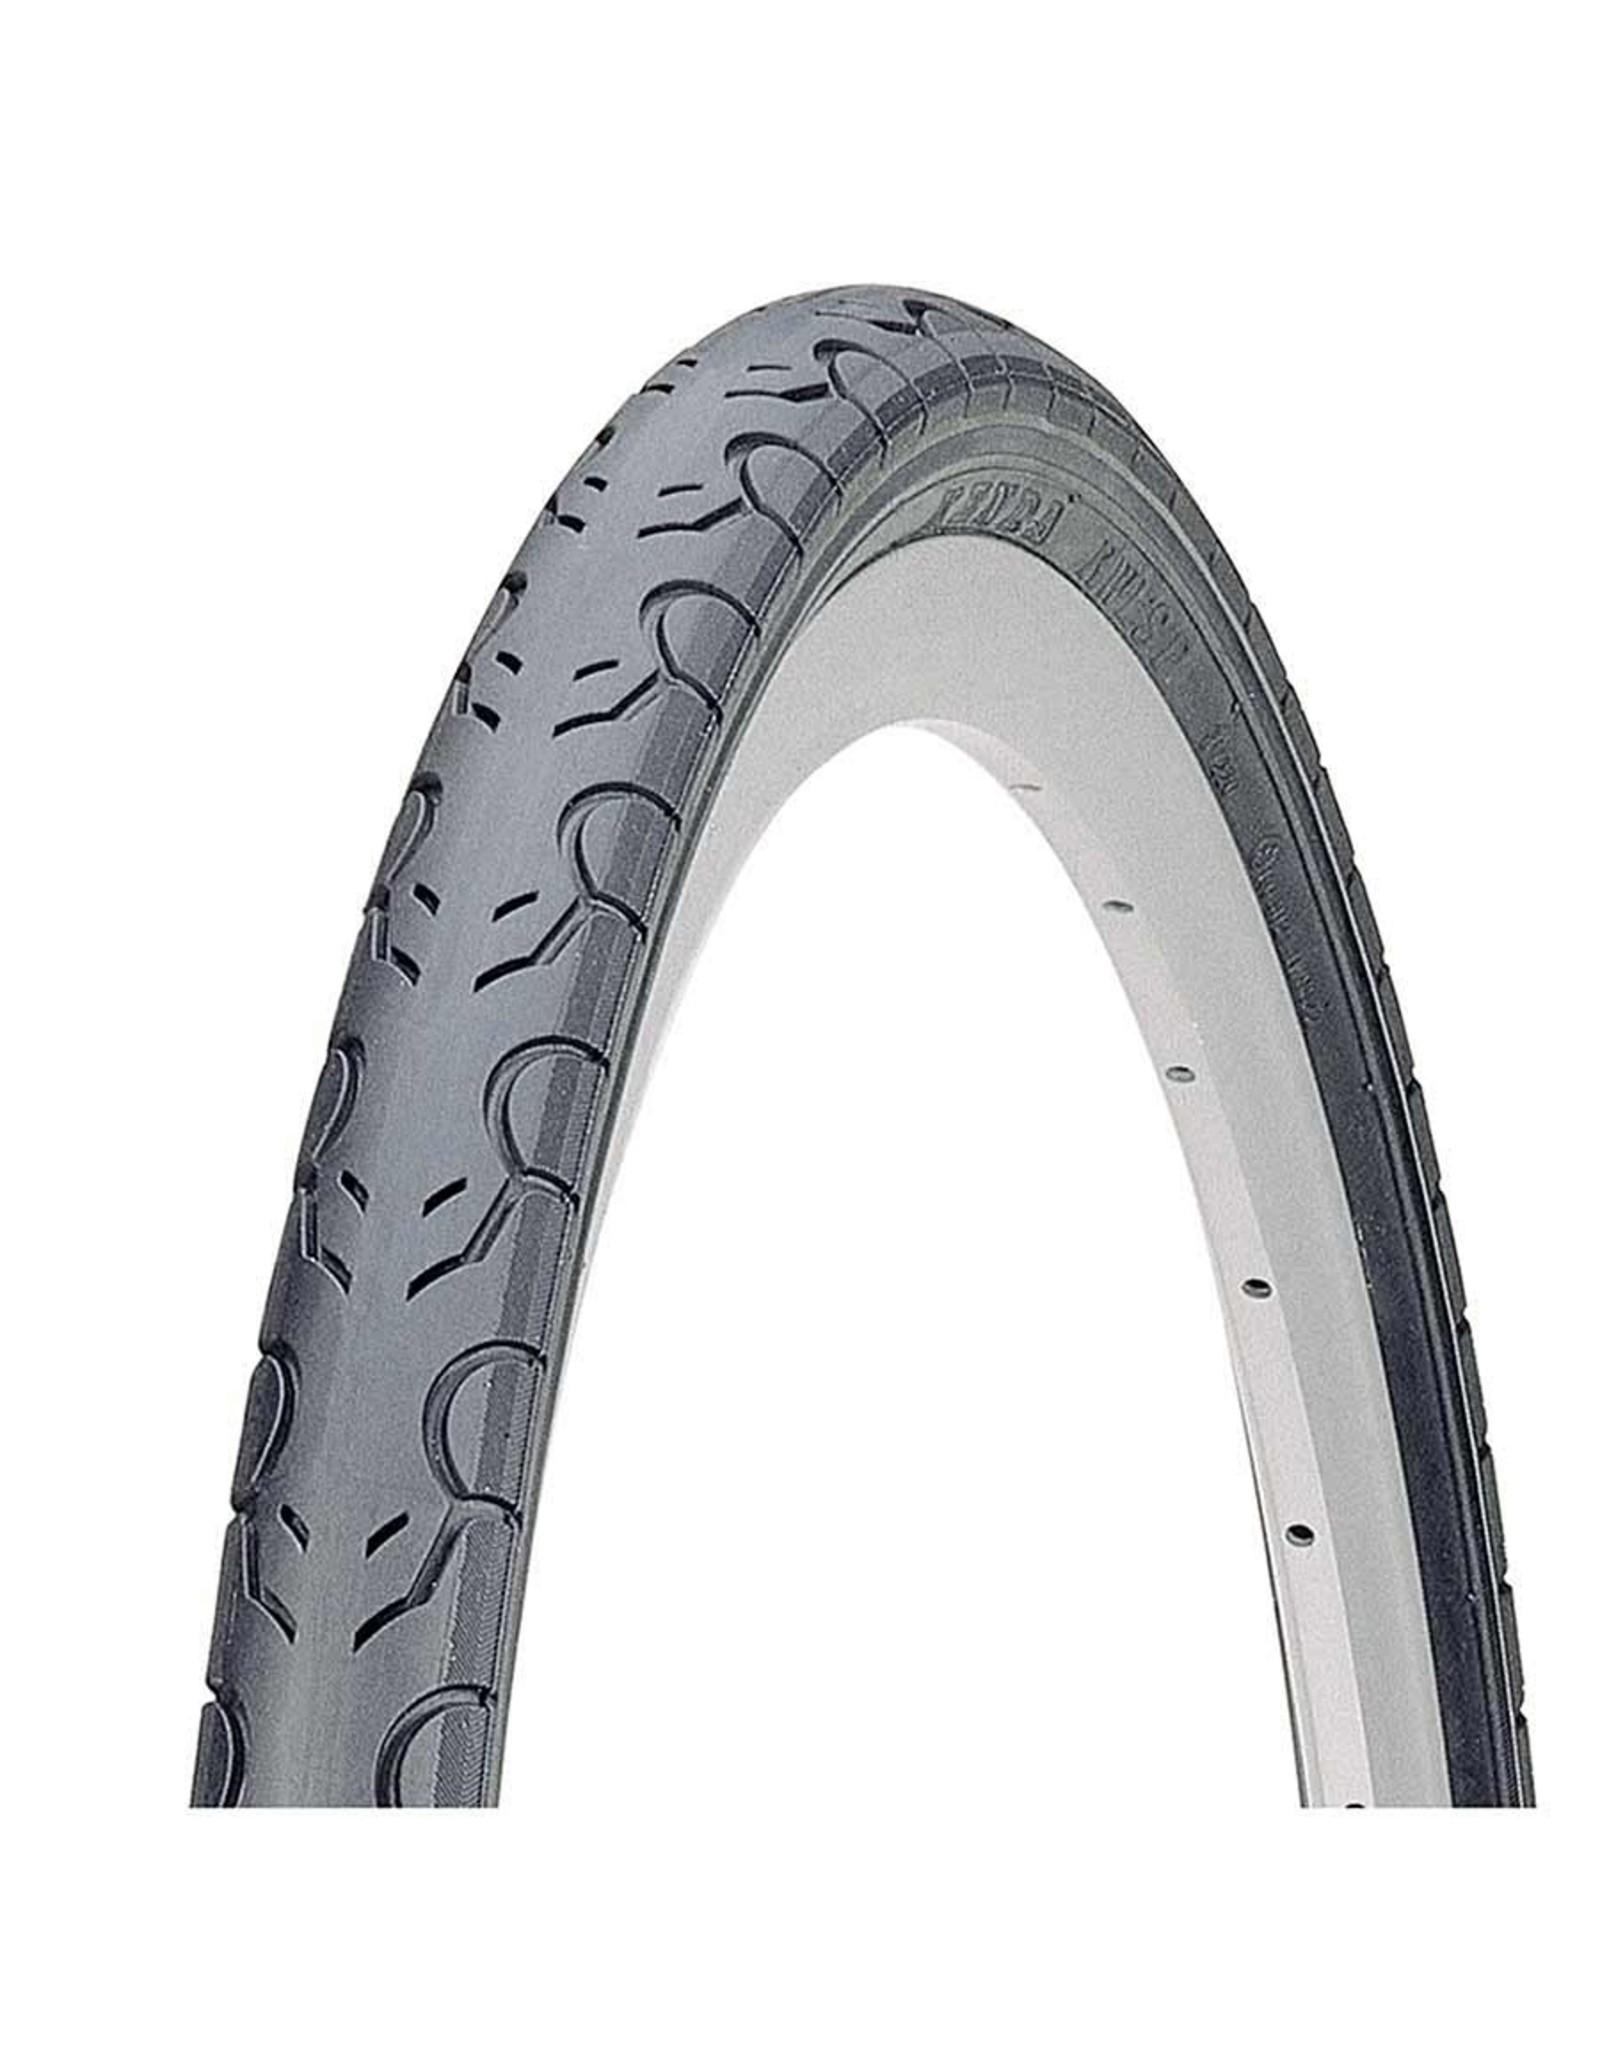 Kenda Kenda, Kwest K193, Tire, 700x35C, Wire, Clincher, 60TPI, Black